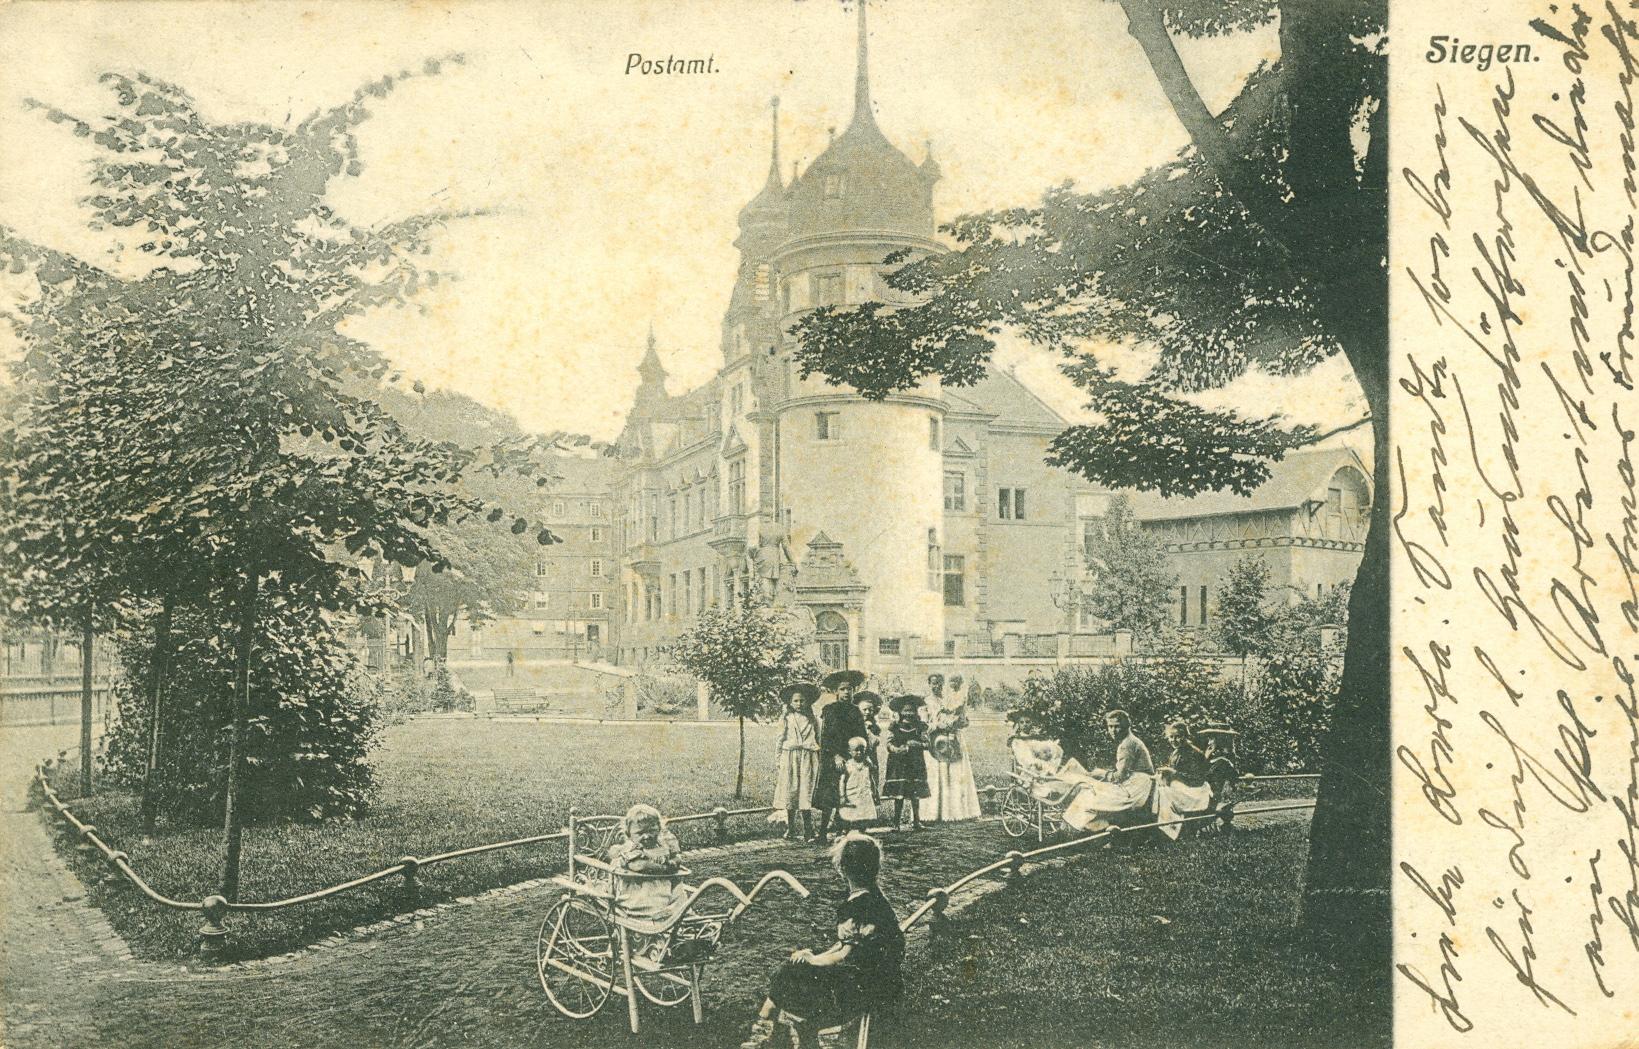 Alte Postkarte. Motiv: Altes Telegraphenamt in Siegen